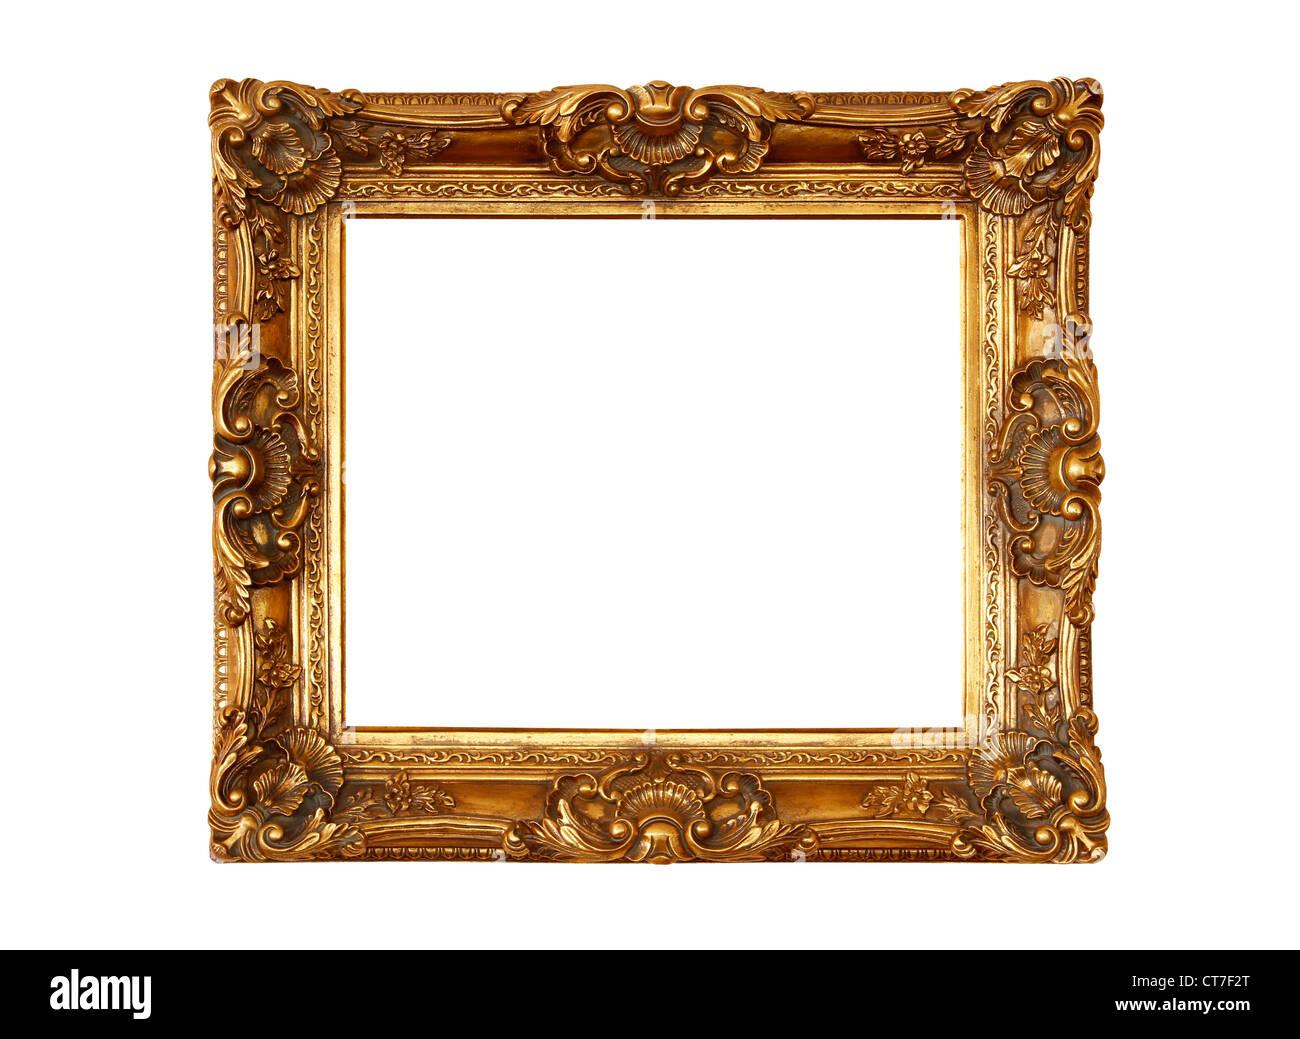 Gilded Frame Stock Photos & Gilded Frame Stock Images - Alamy